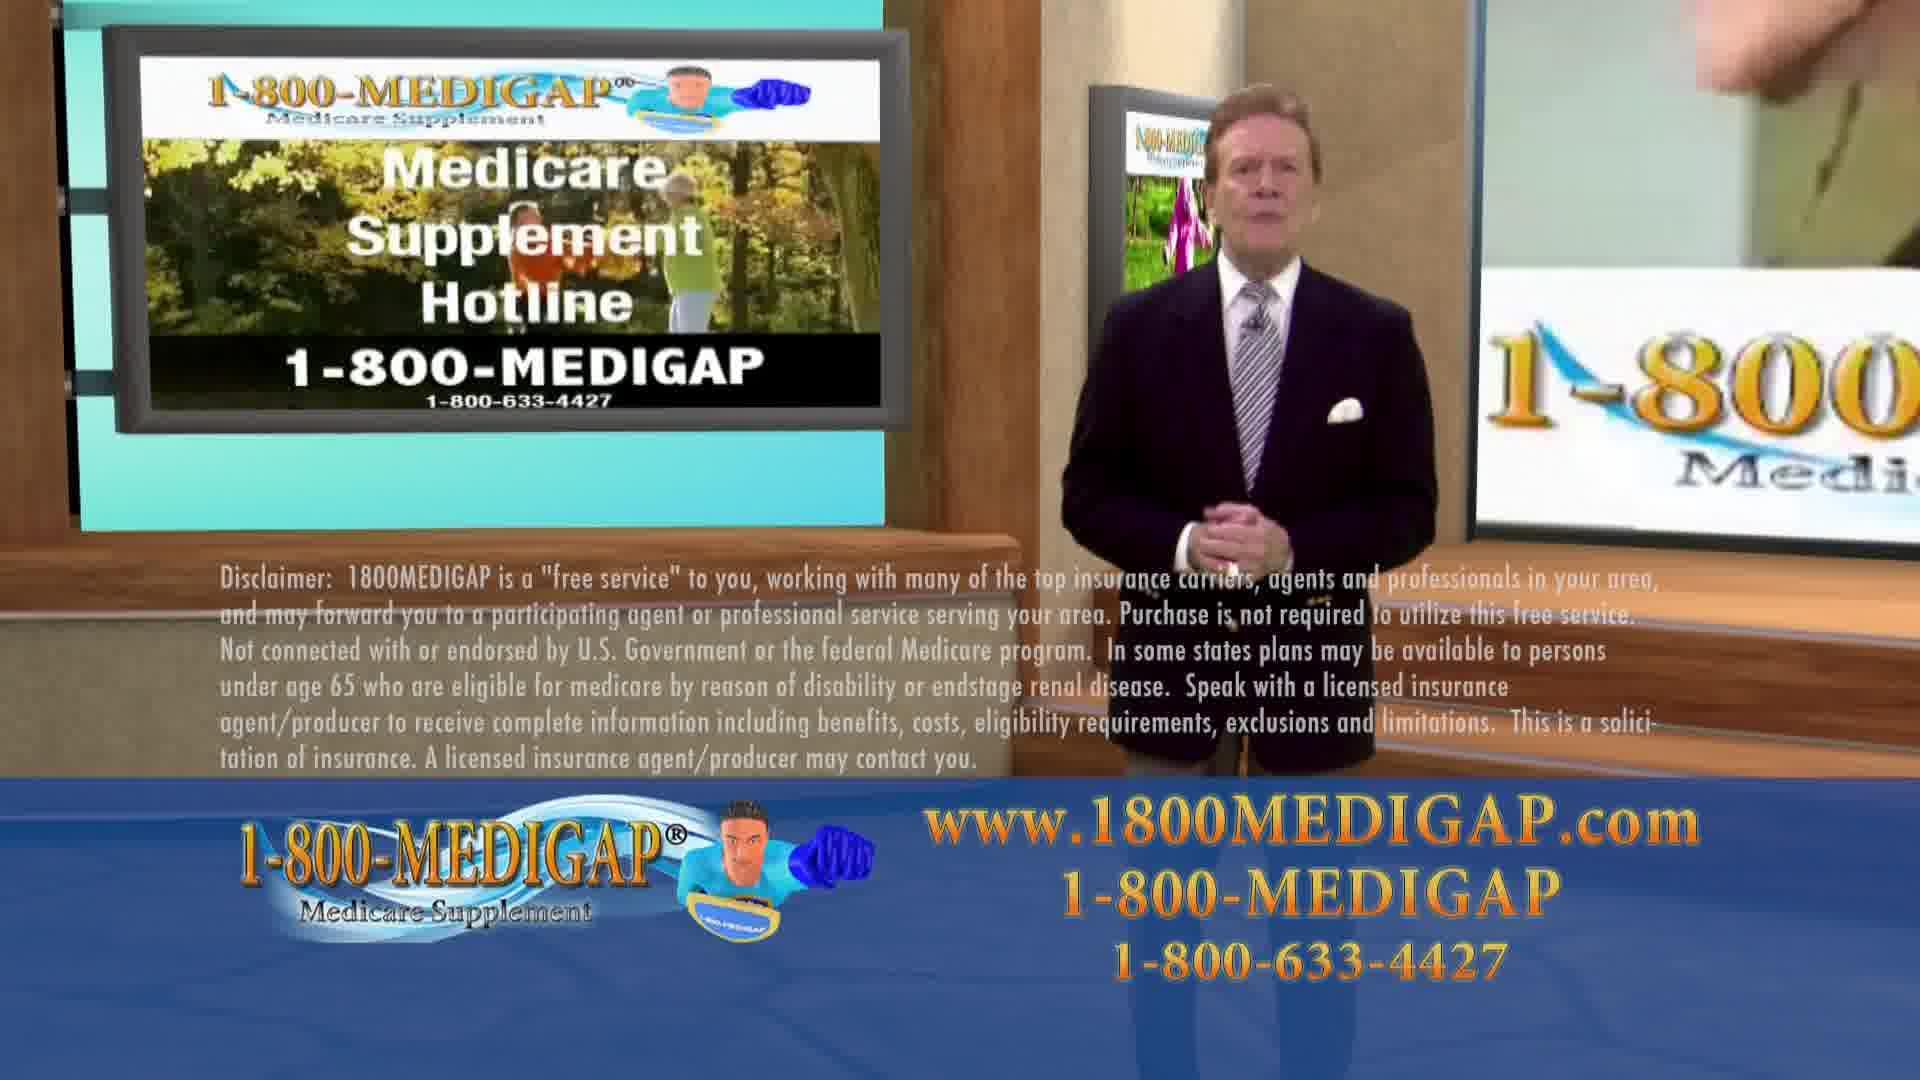 Medicare Supplemental Coverage Rates